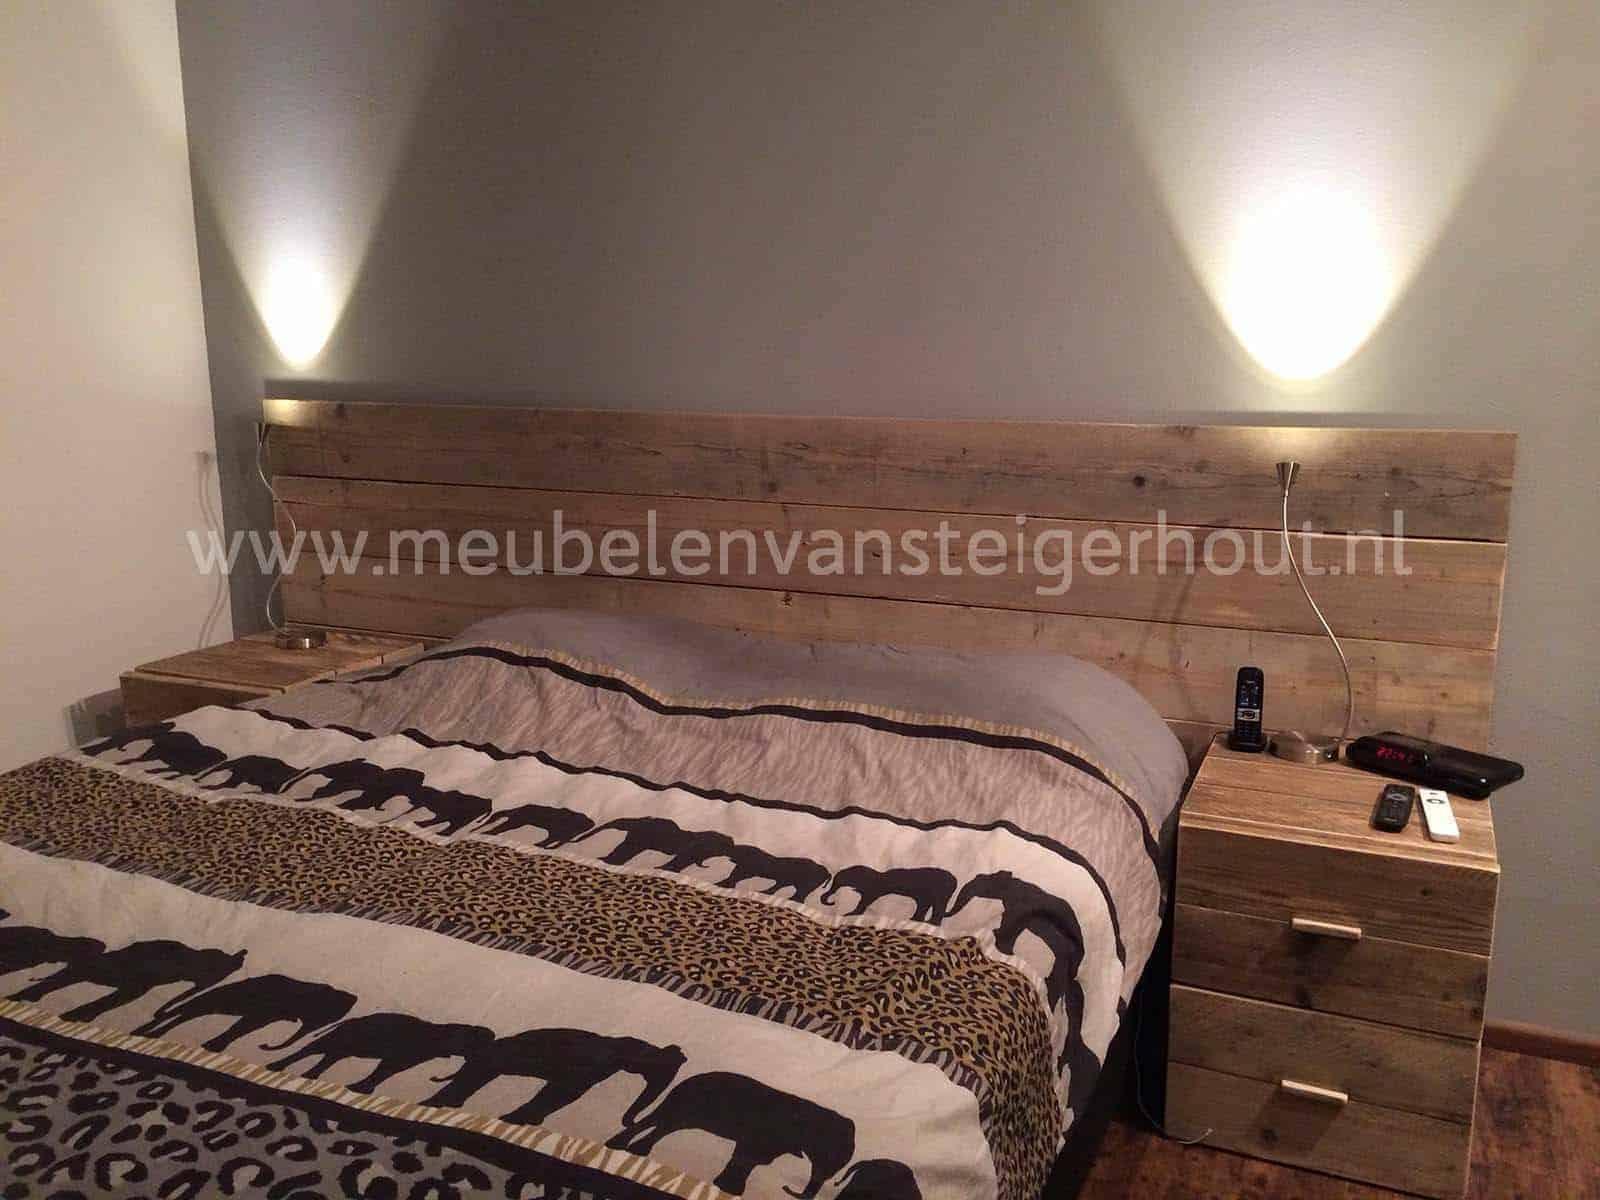 Slaapkamer | Meubelen van Steigerhout